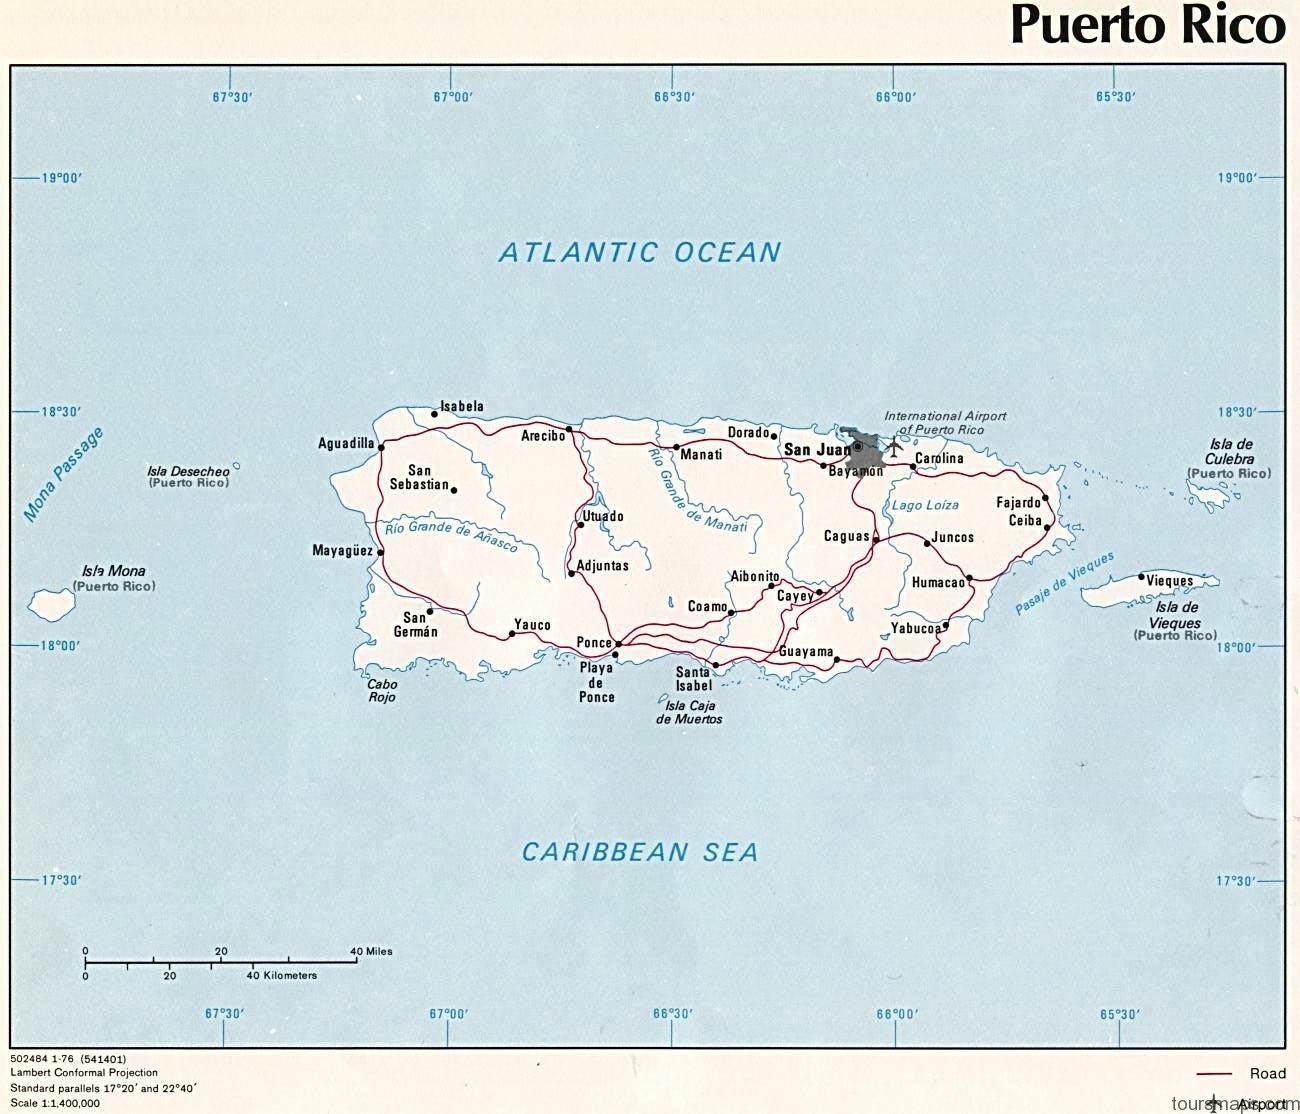 Puerto Rico Maps_4.jpg